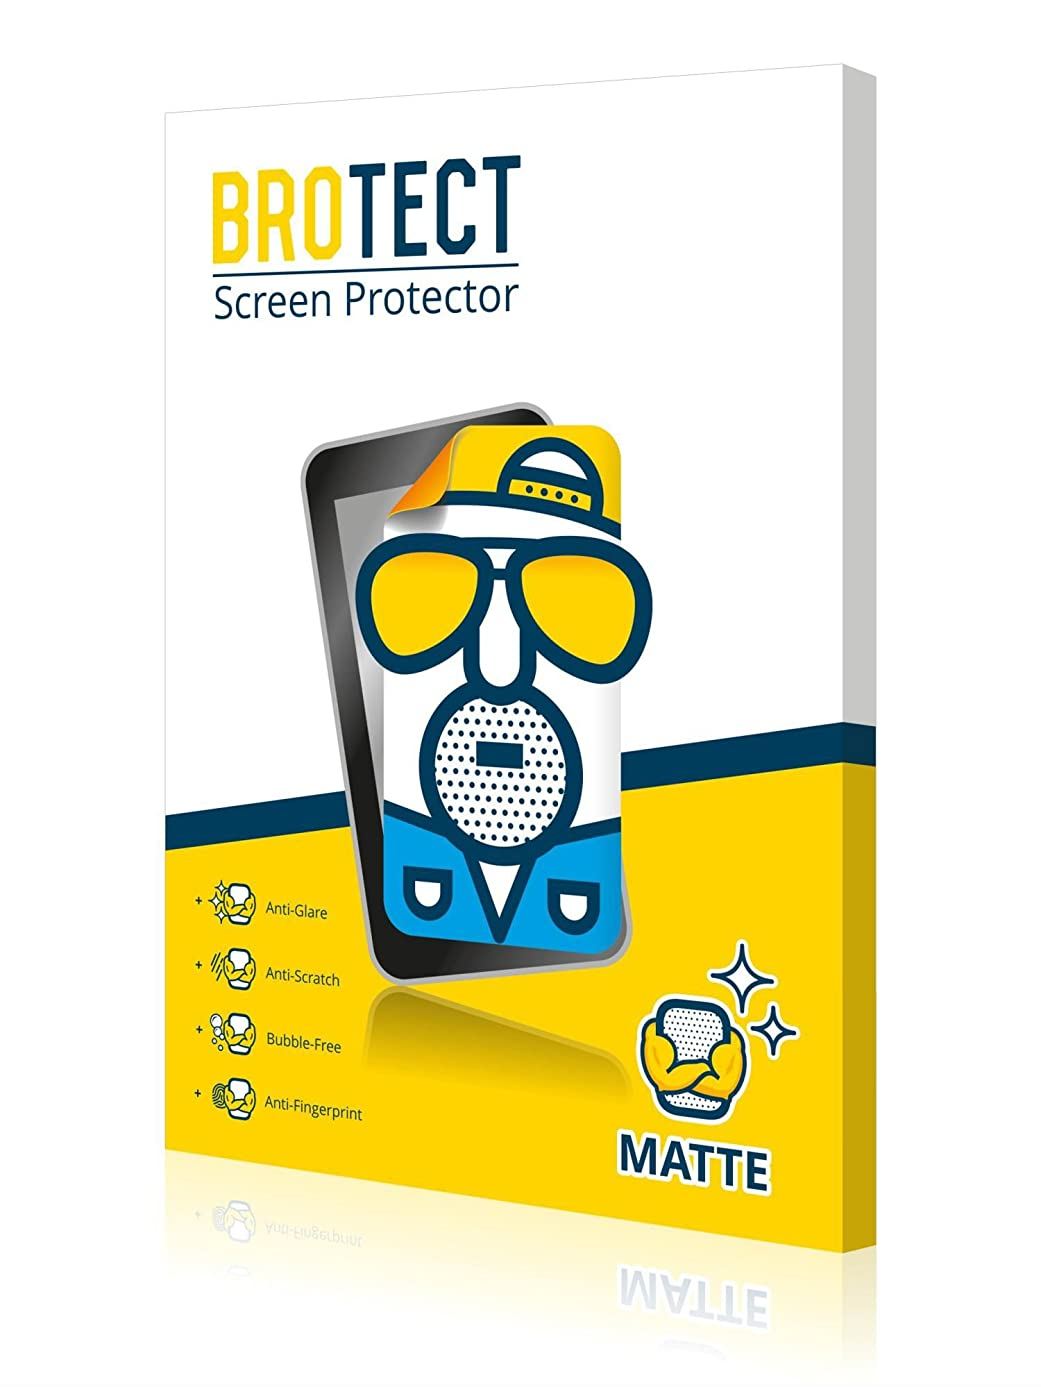 BROTECT. 2X Matte Screen Protector for Huawei Y9 2019, Matte, Anti-Glare, Anti-Scratch